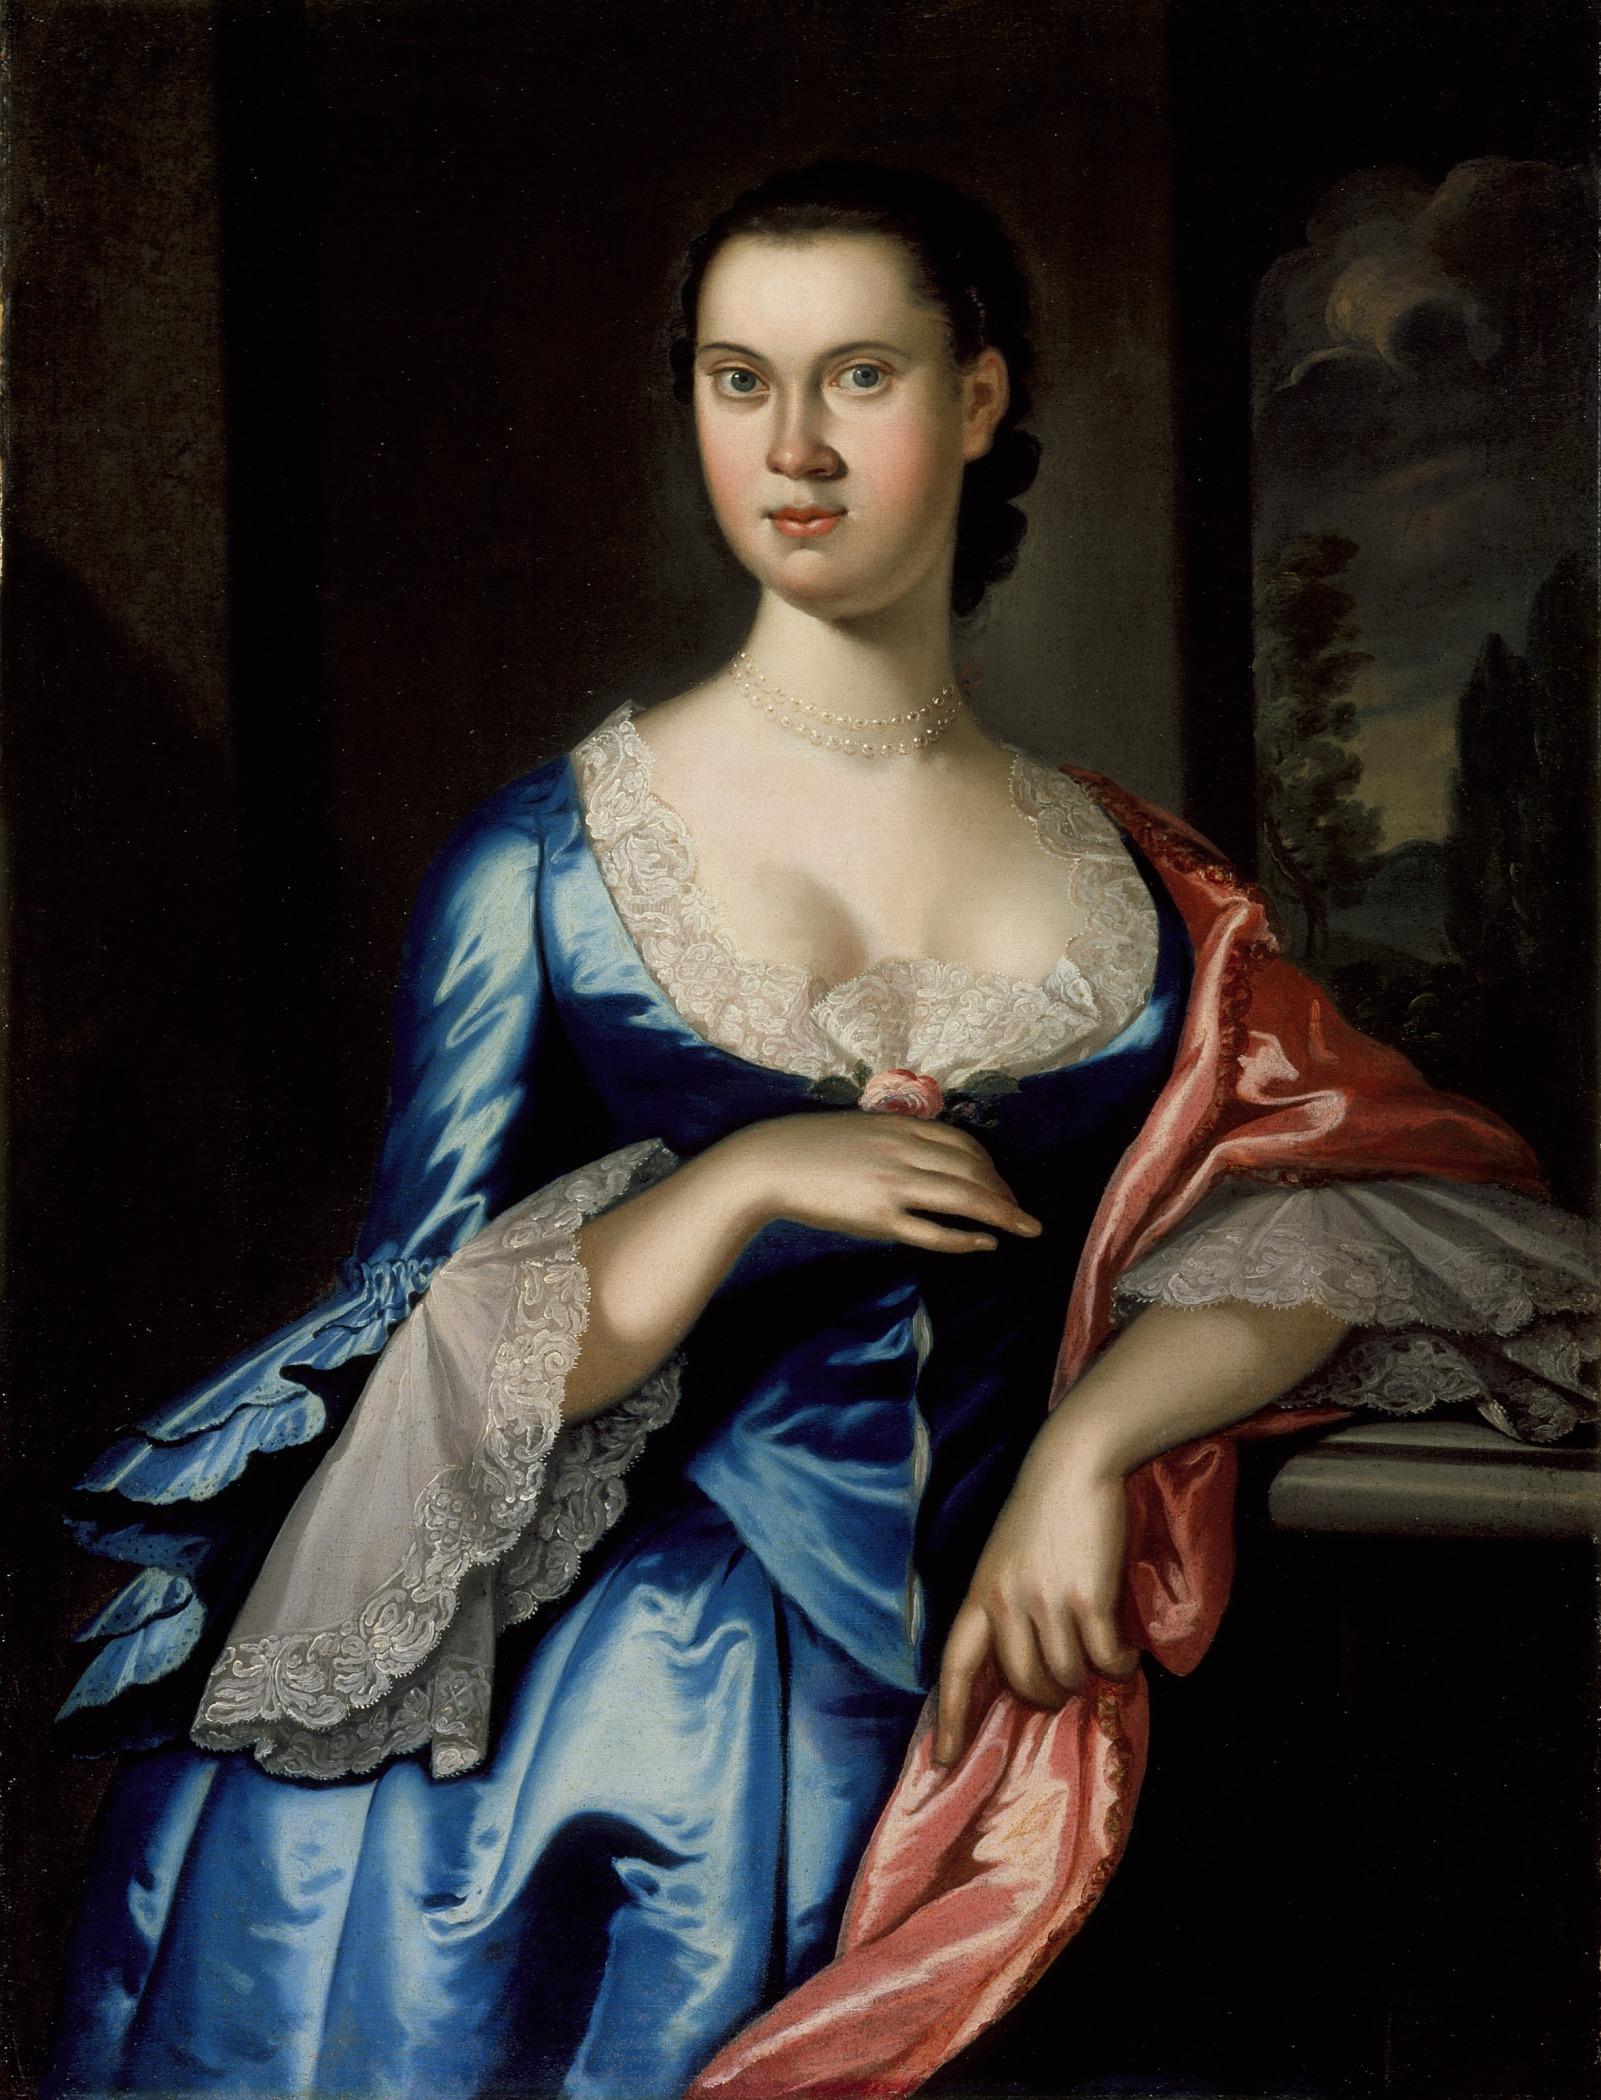 https://upload.wikimedia.org/wikipedia/commons/9/9b/Portrait_of_Elizabeth_Chew_Smith_LACMA_M.86.1.jpg